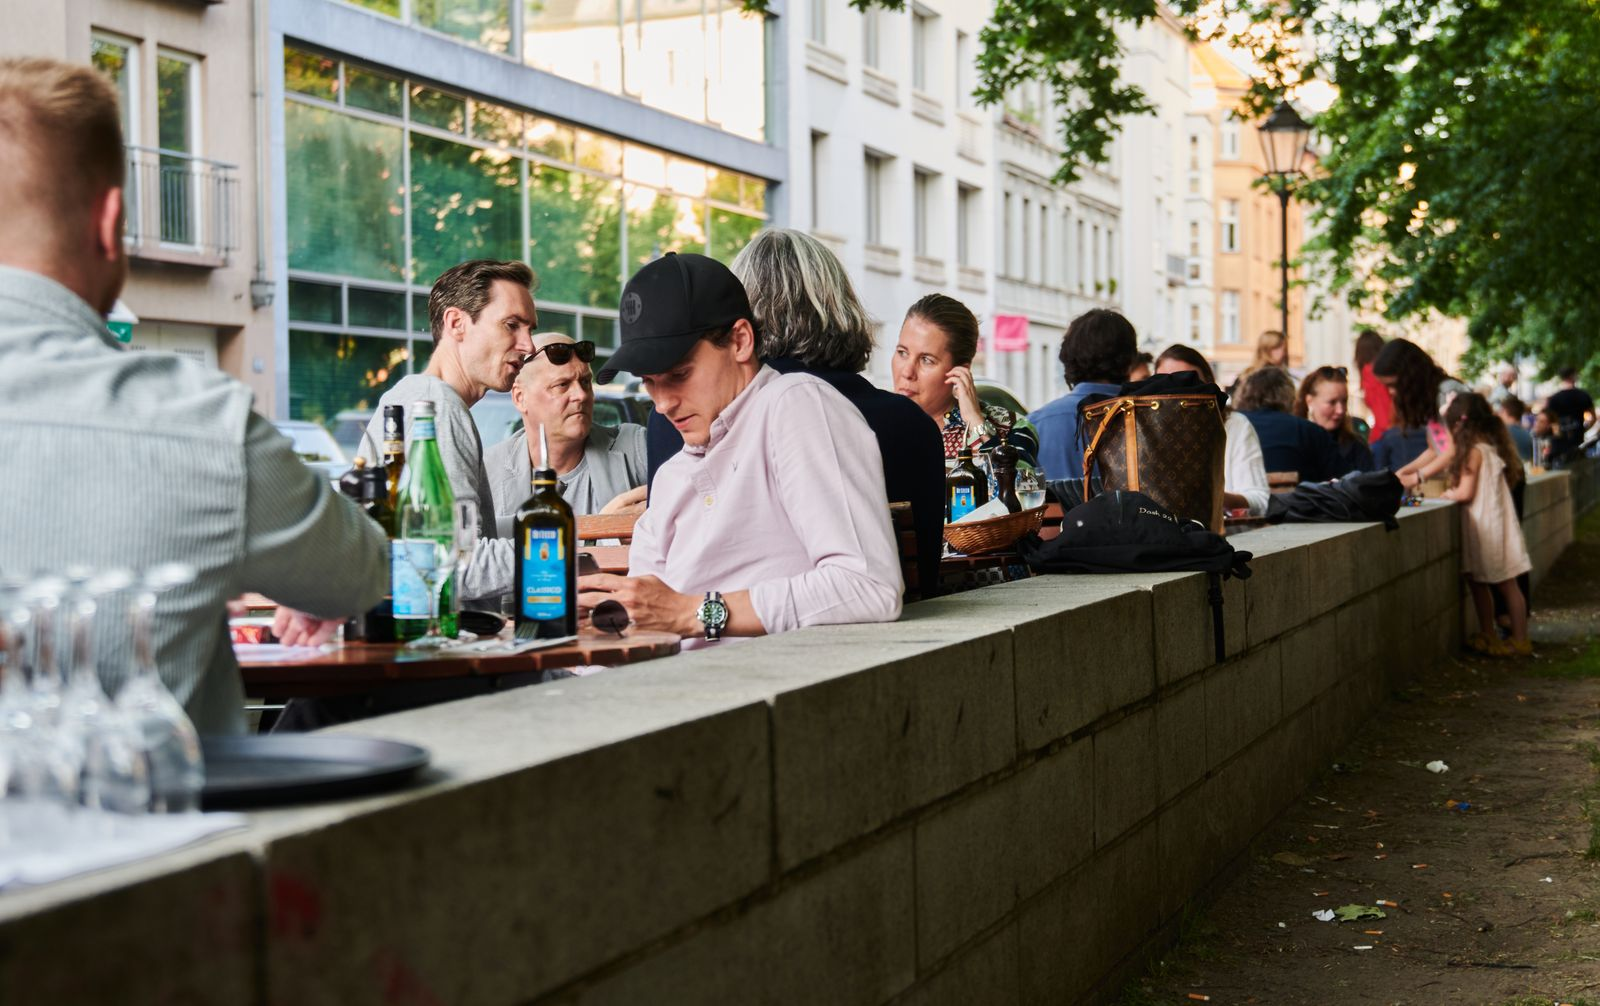 Coronavirus - Gastronomie in Berlin